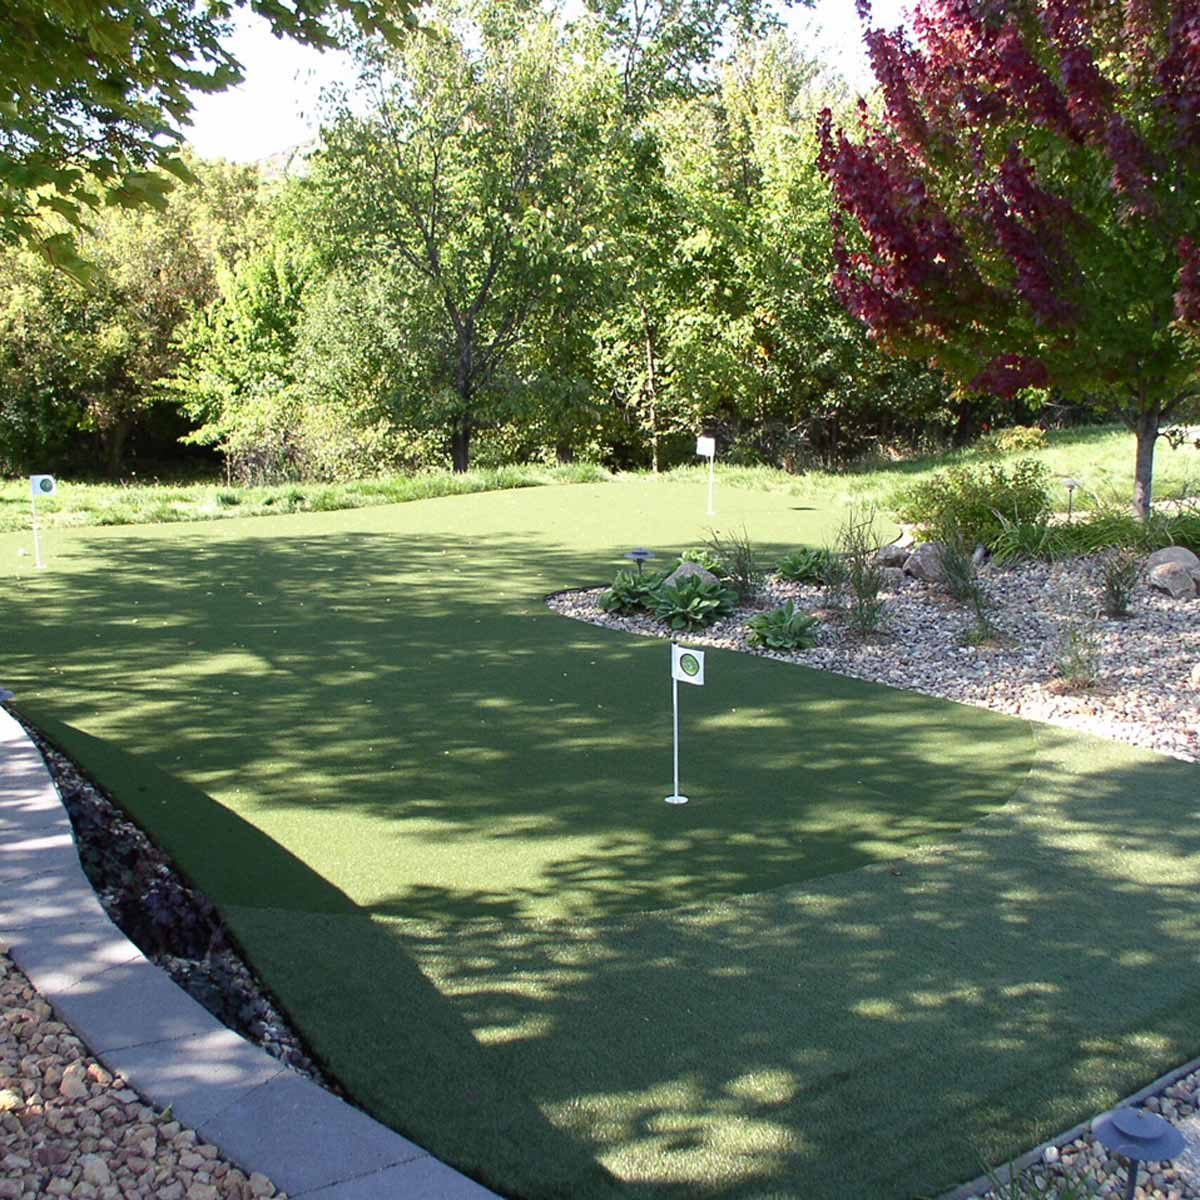 19 Crazy Cool Backyard Putting Greens — The Family Handyman